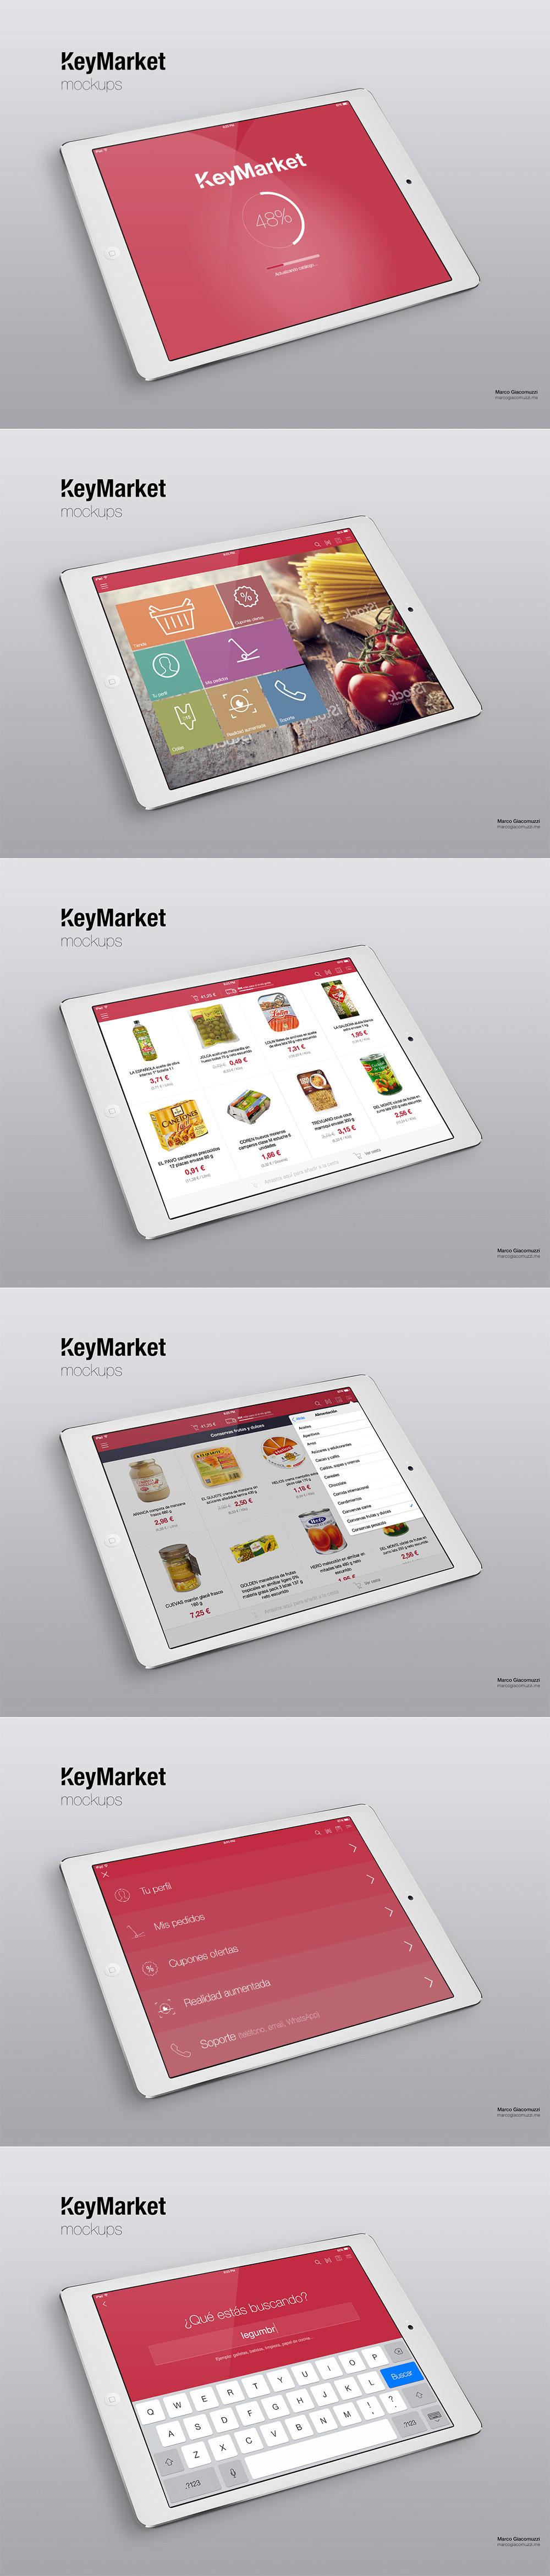 app,Ecommerce,concept design,mobile,iPad,tablet,UI